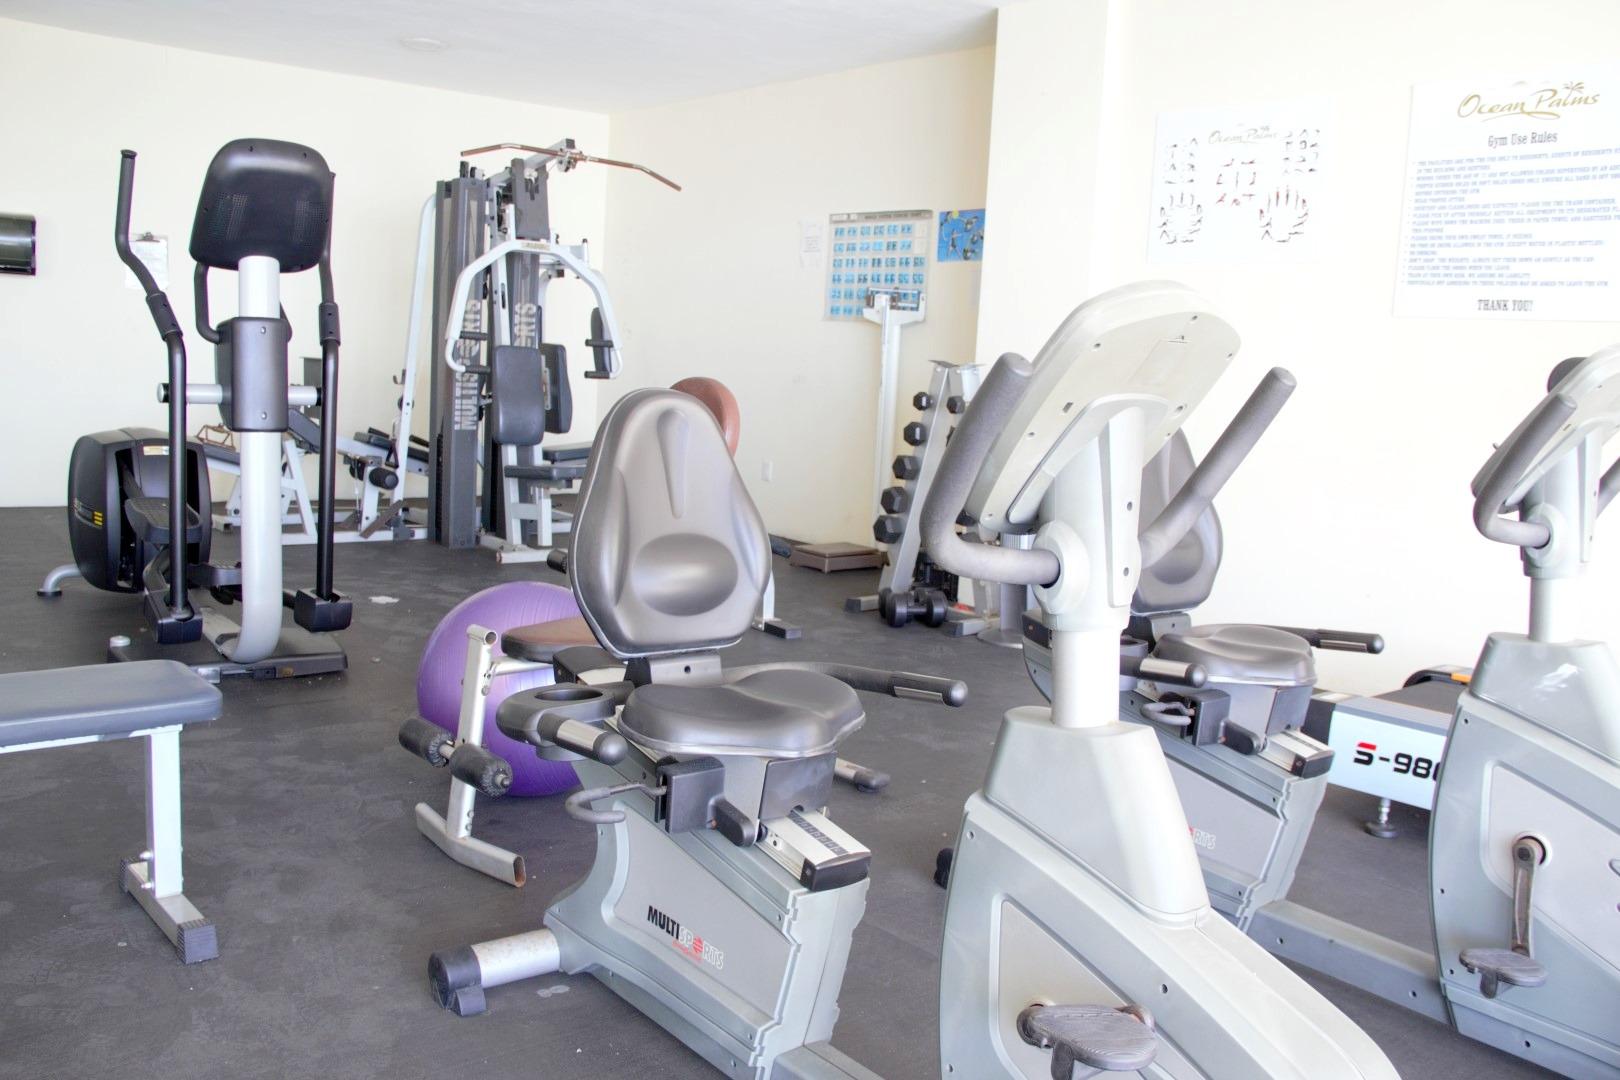 Ocean Palms gym on main floor, overlooking the pool area.